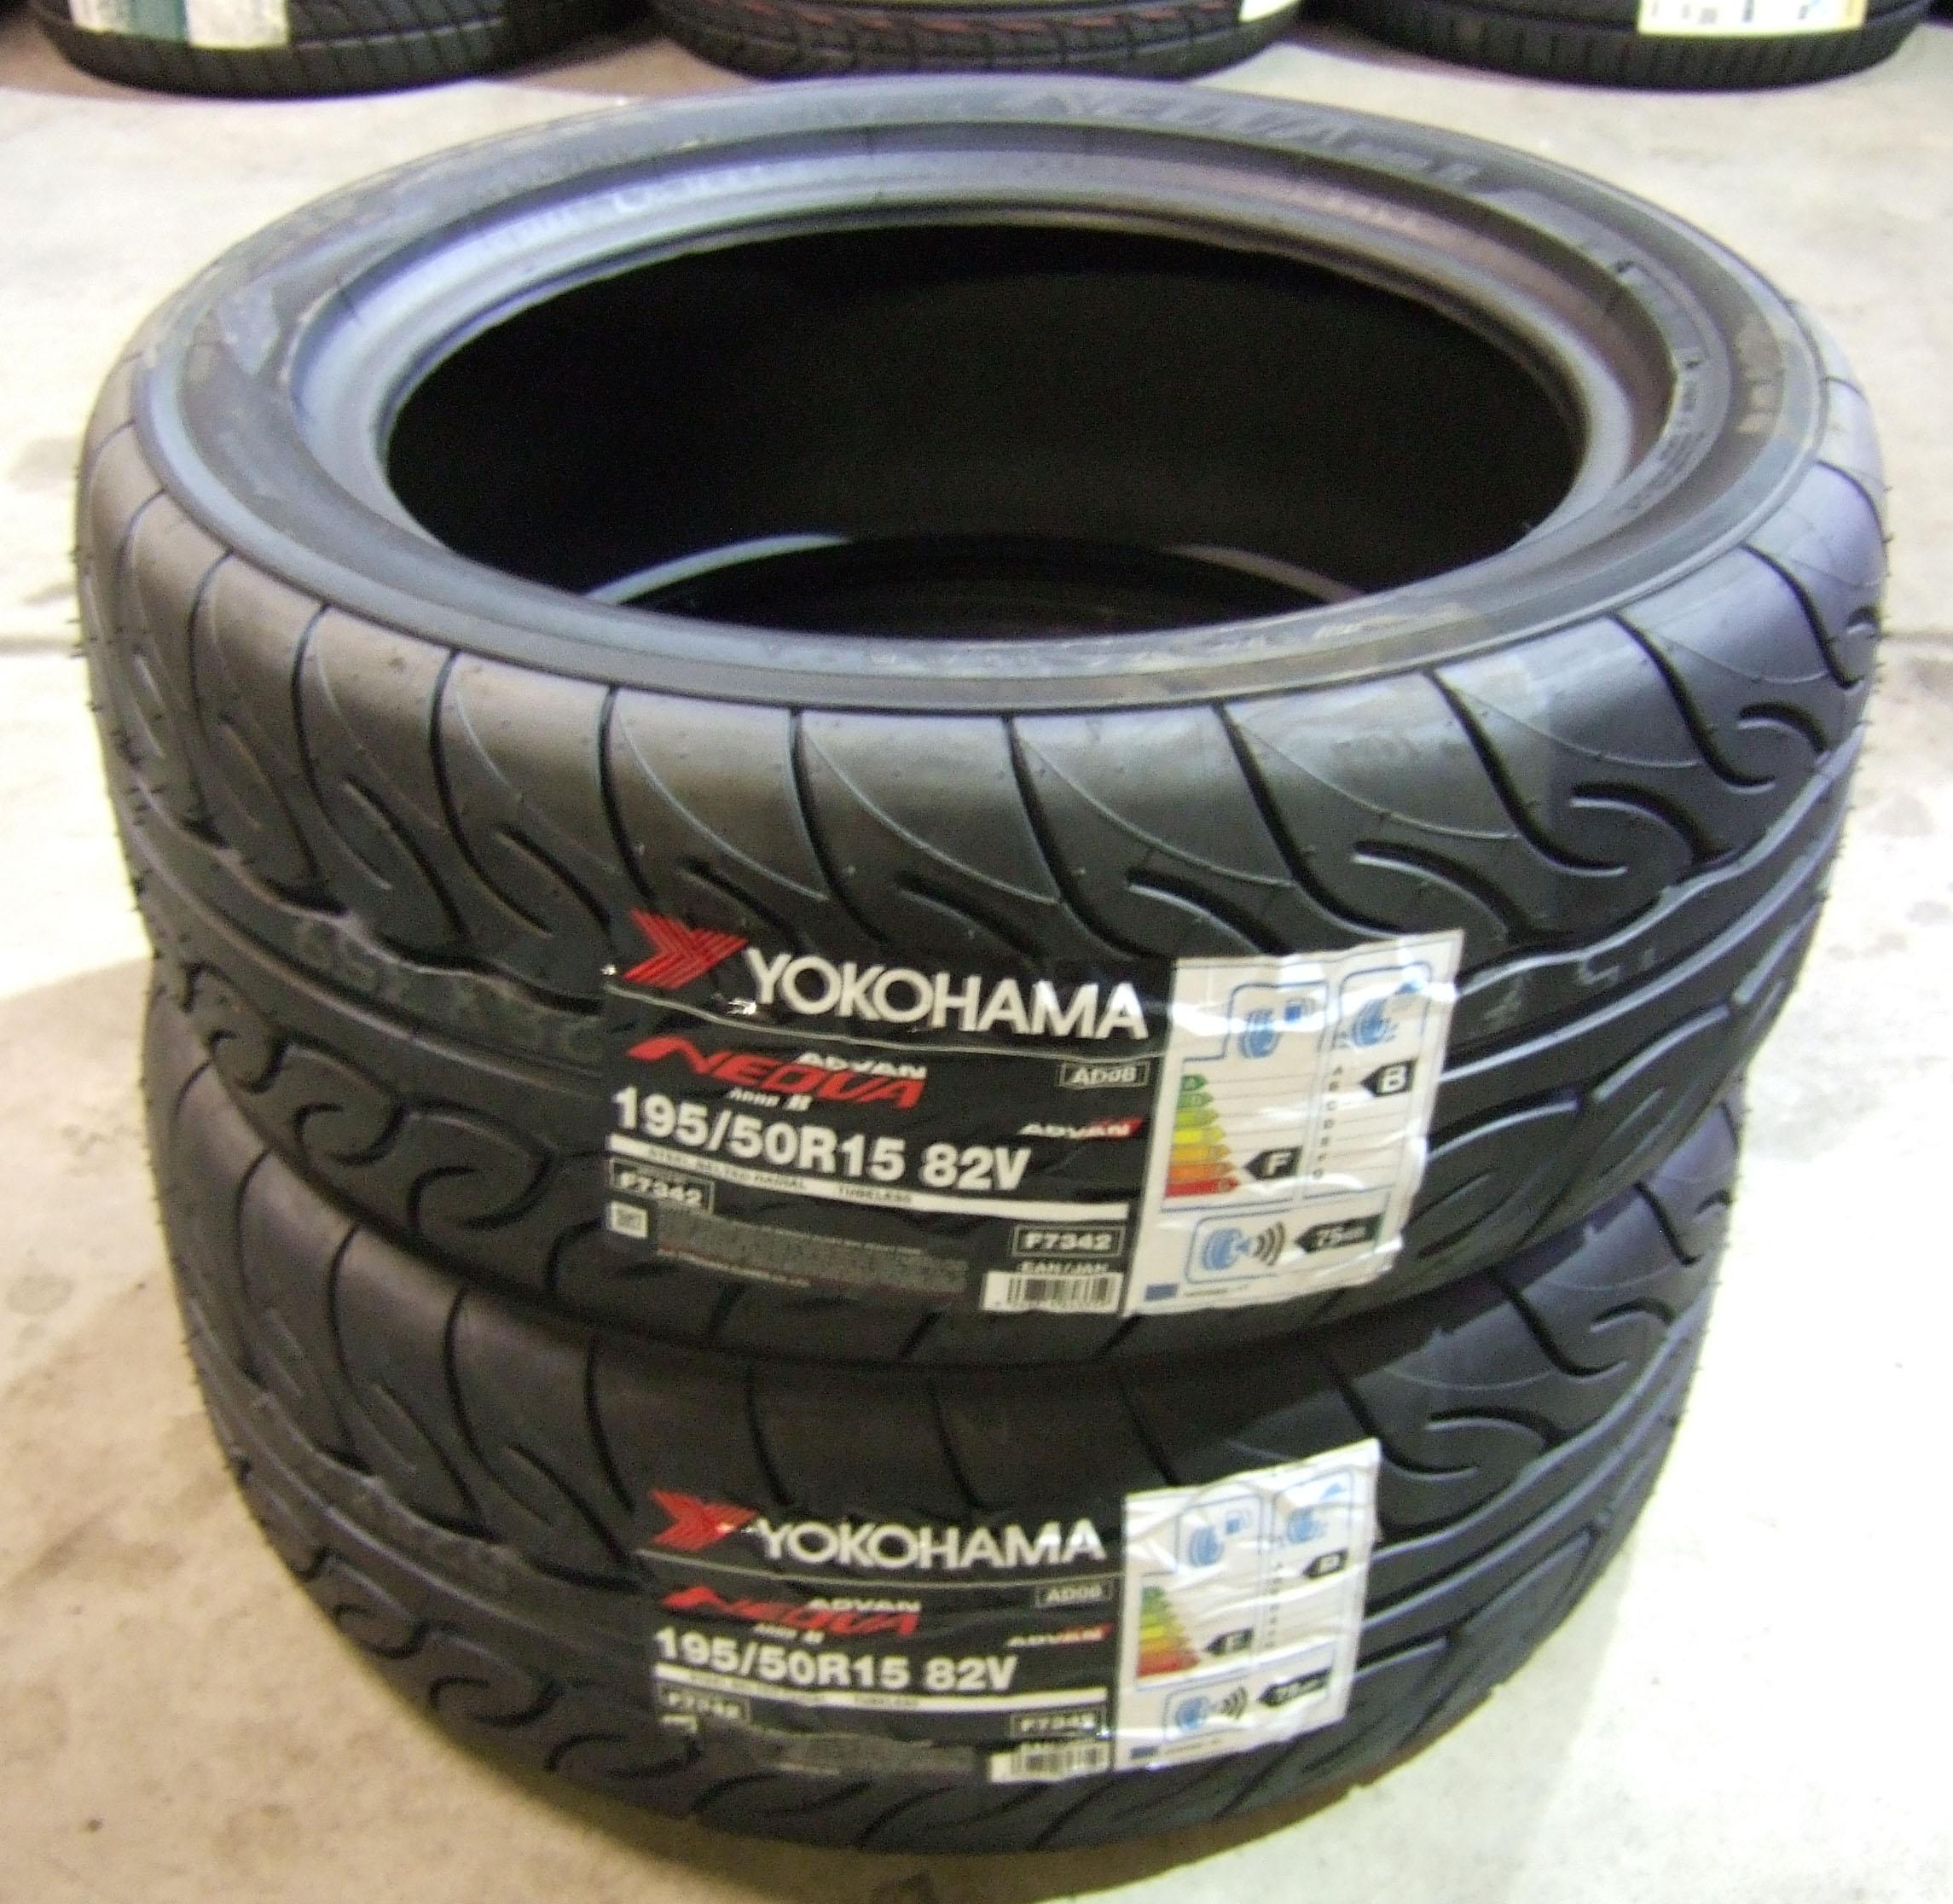 195 50 15 yokohama ad08 road legal track day tyres 1955015 82v 195 50 15 x2 ebay. Black Bedroom Furniture Sets. Home Design Ideas